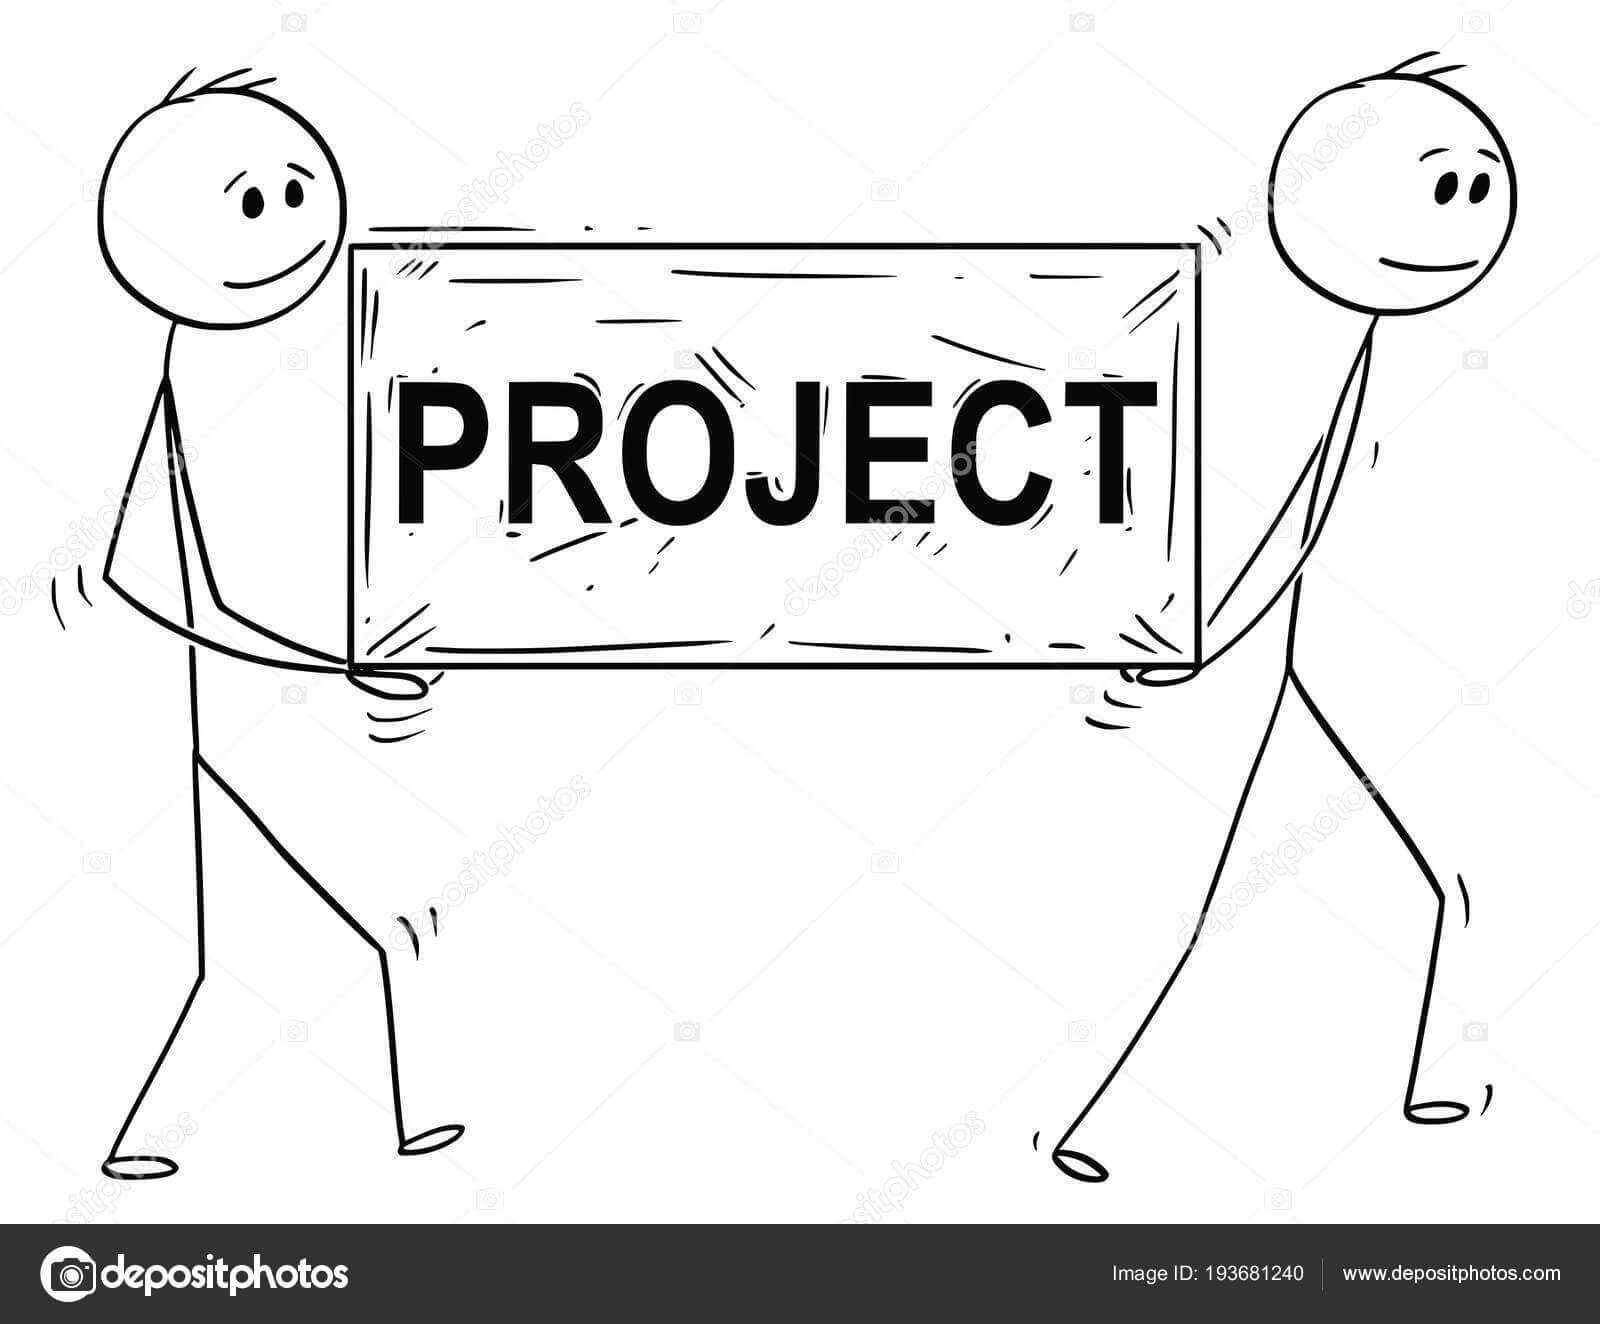 Get Online Ignou MARD Project